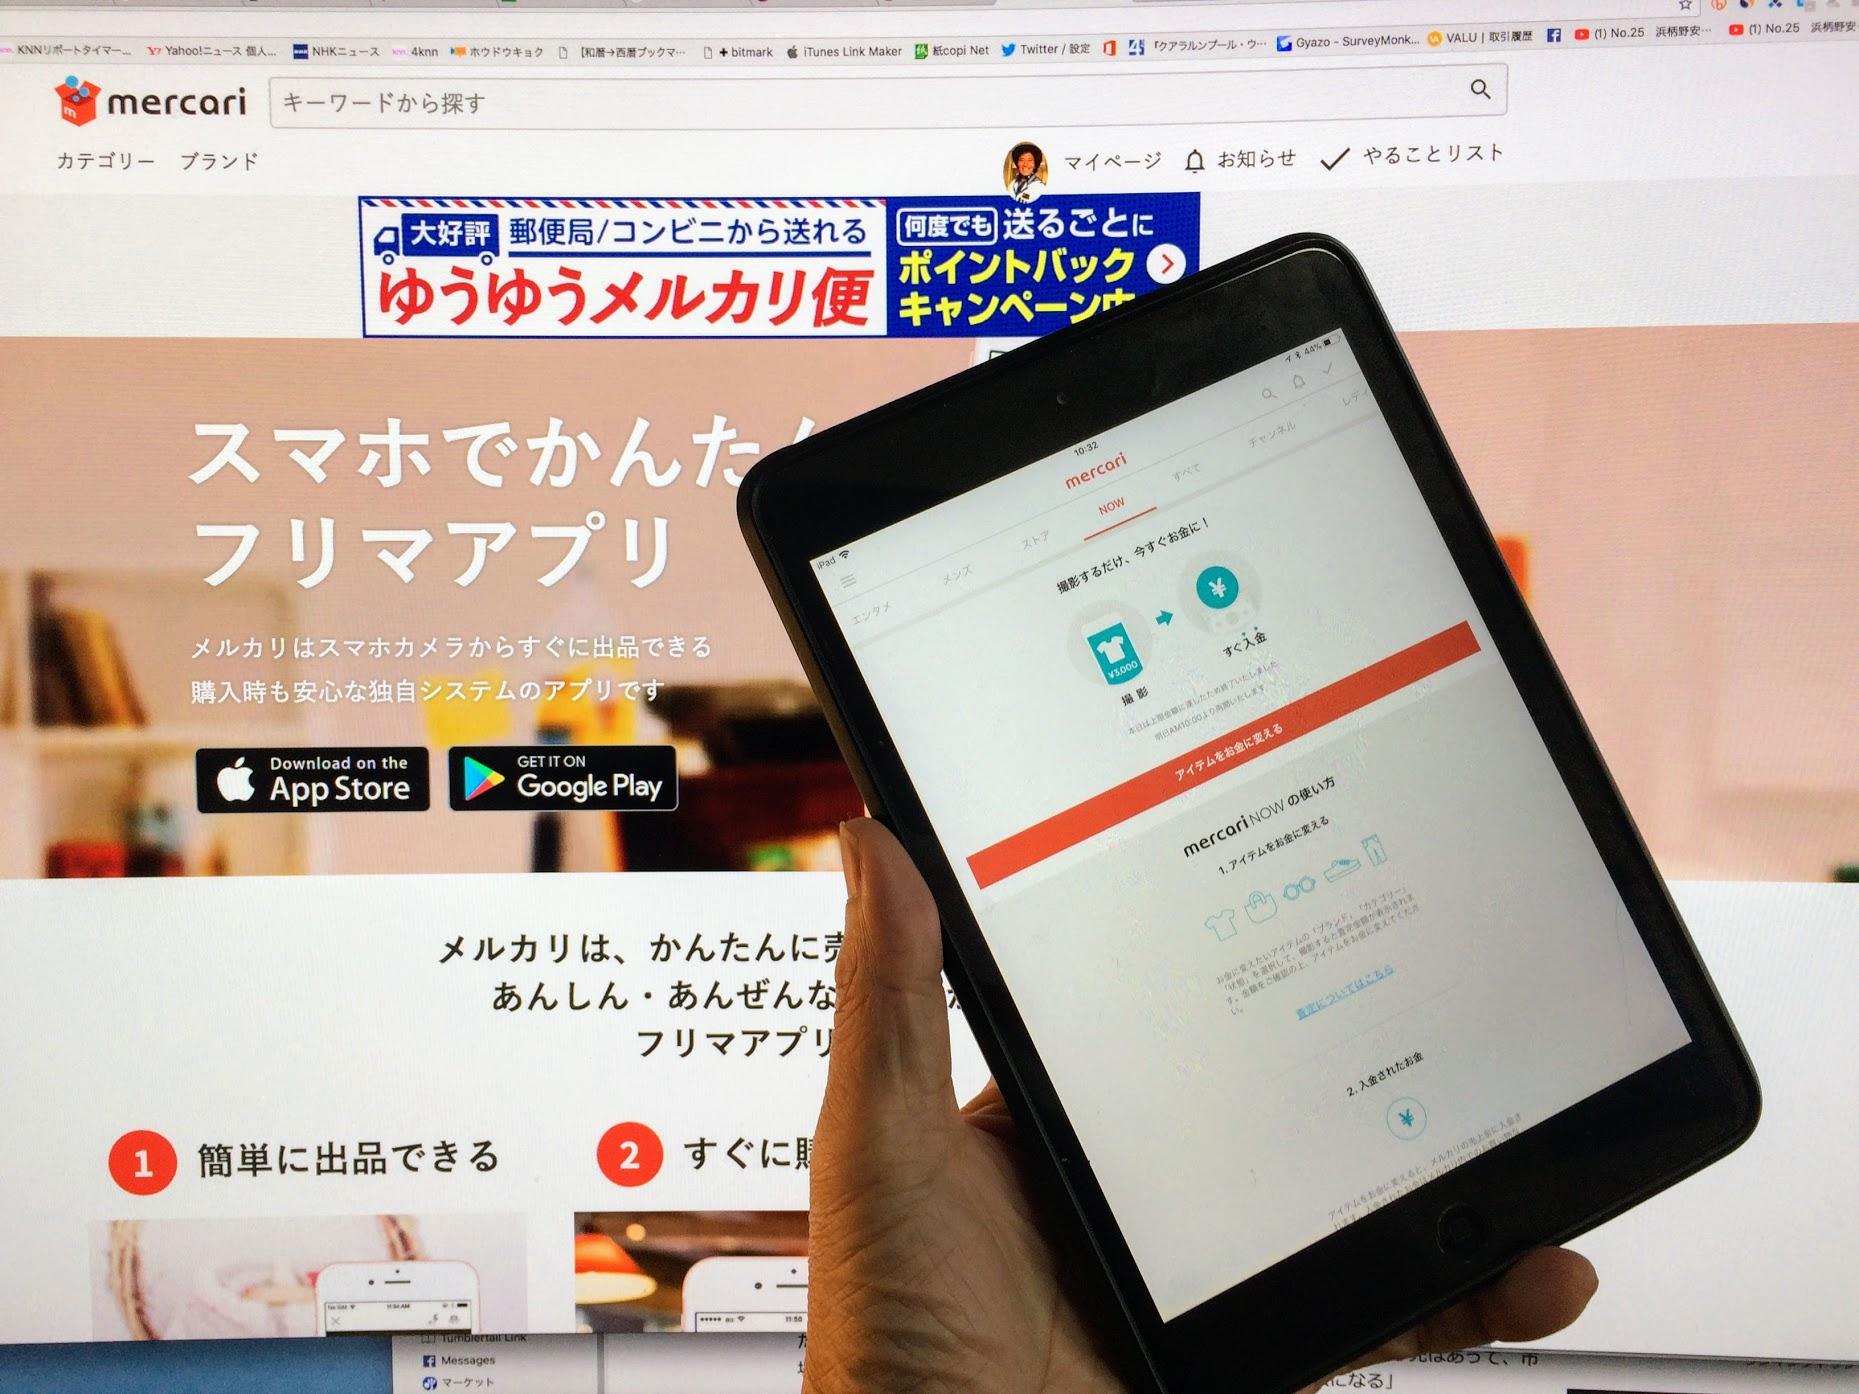 【Yahooニュース記事】メルカリNOW、即時買い取り二次市場が激アツな理由 4